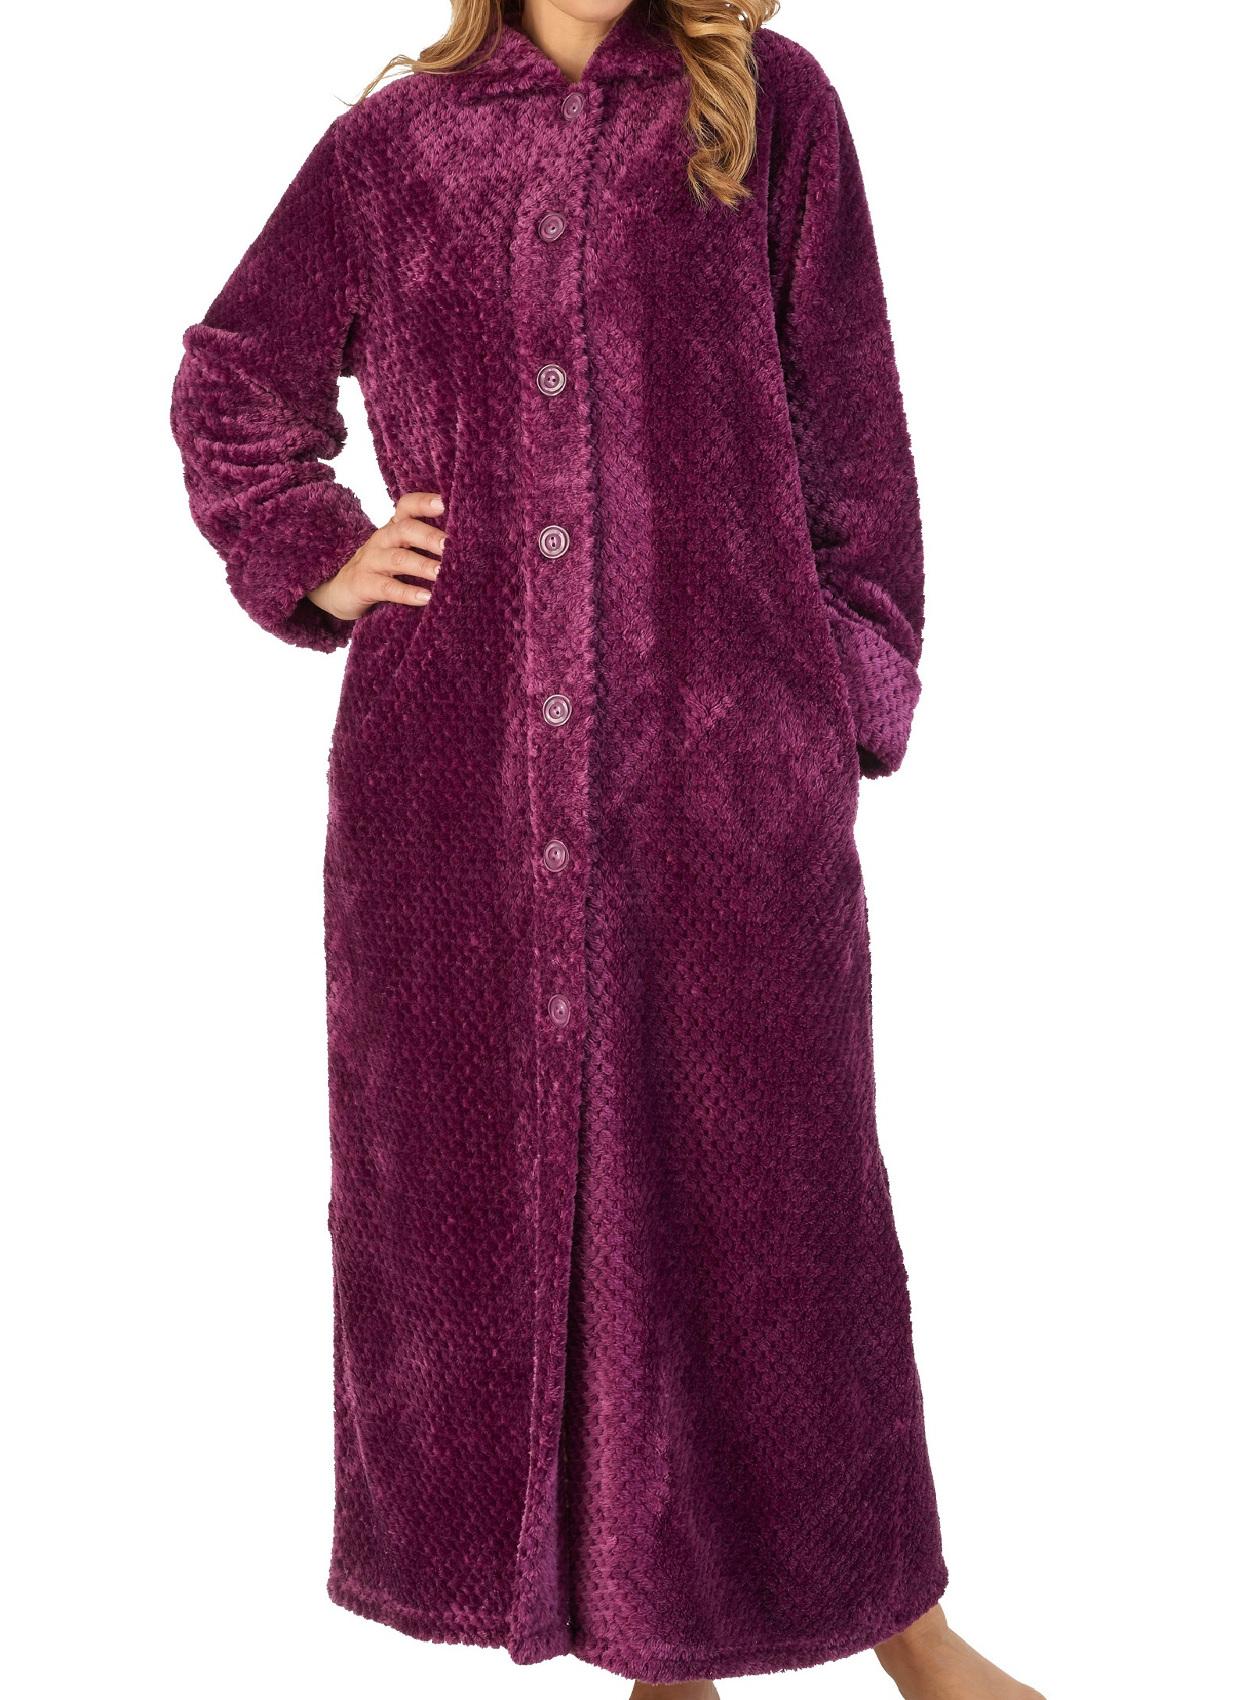 Robe de Chambre Femme Boutonné Luxe Waffle Polaire Slenderella Nightwear Robe